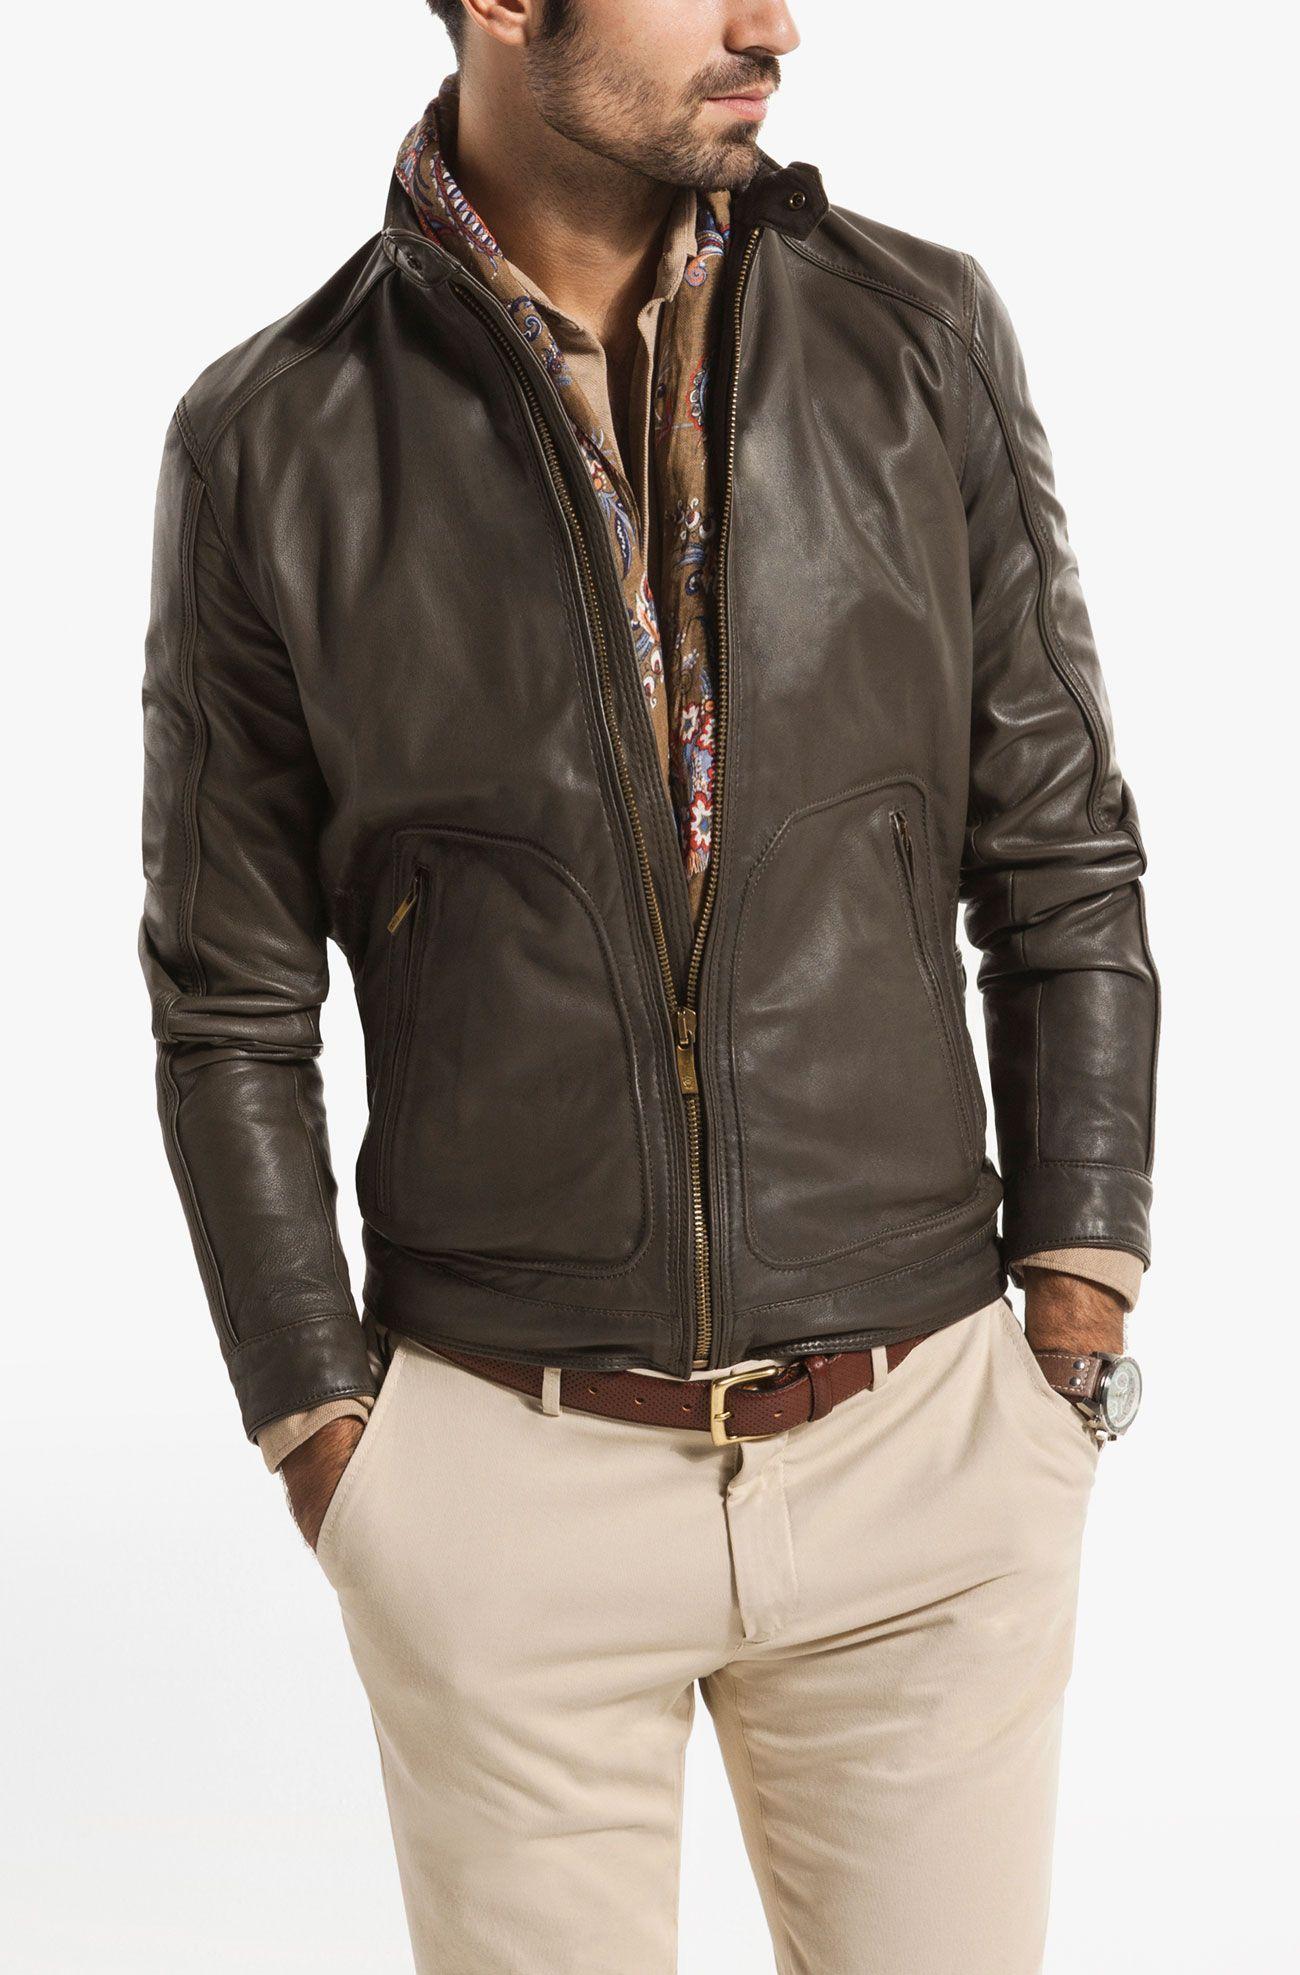 GREEN LEATHER JACKET Massimo Dutti Menswear